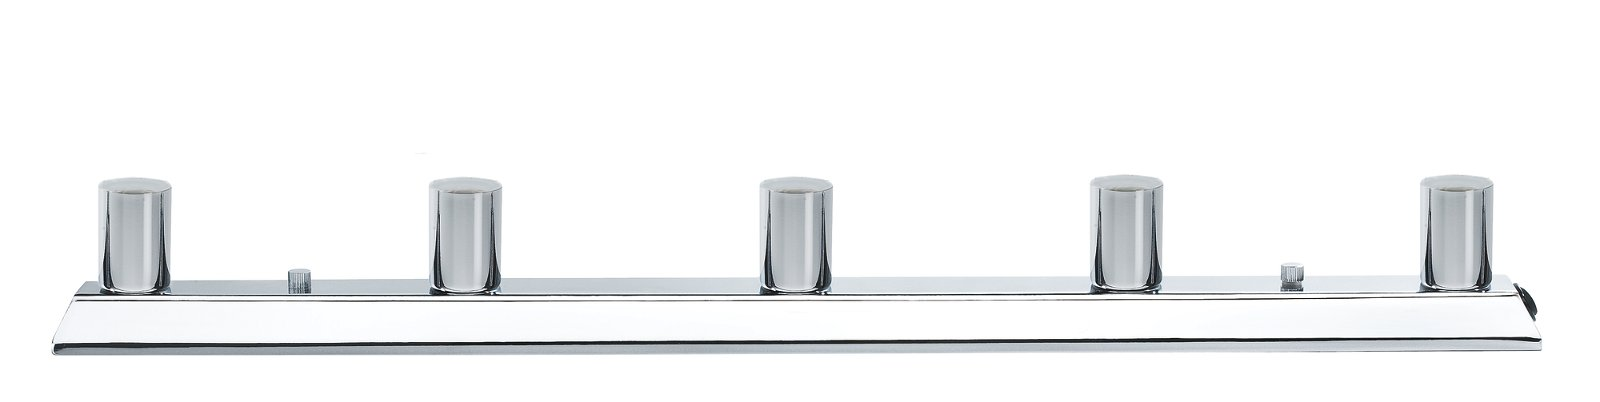 LED-spiegellamp Mirror Regula E14 230V max. 5x40W Chroom